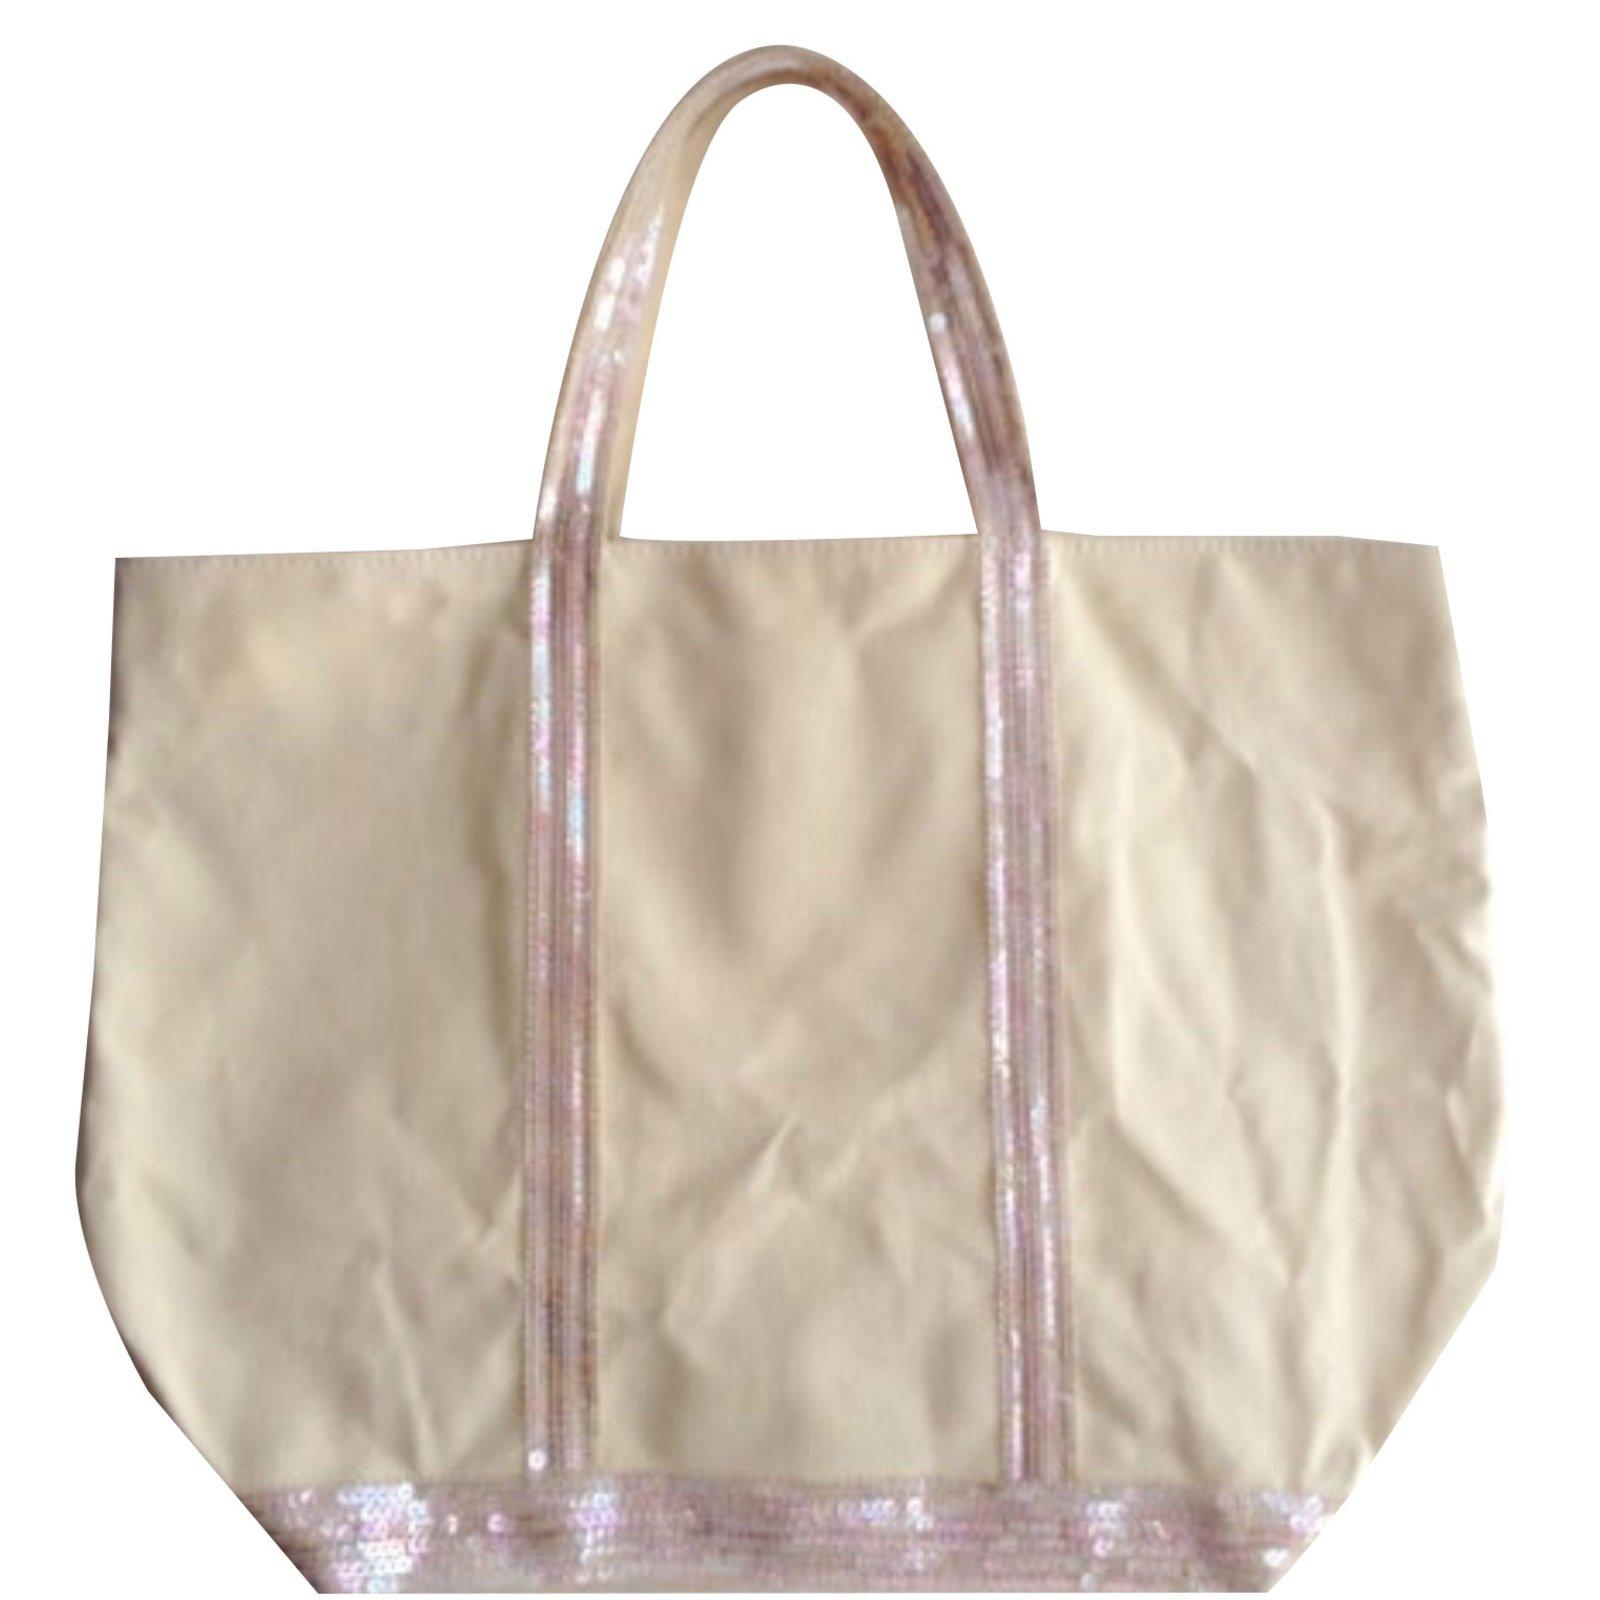 Vanessa Bruno Handbags Cotton Yellow Ref 82433